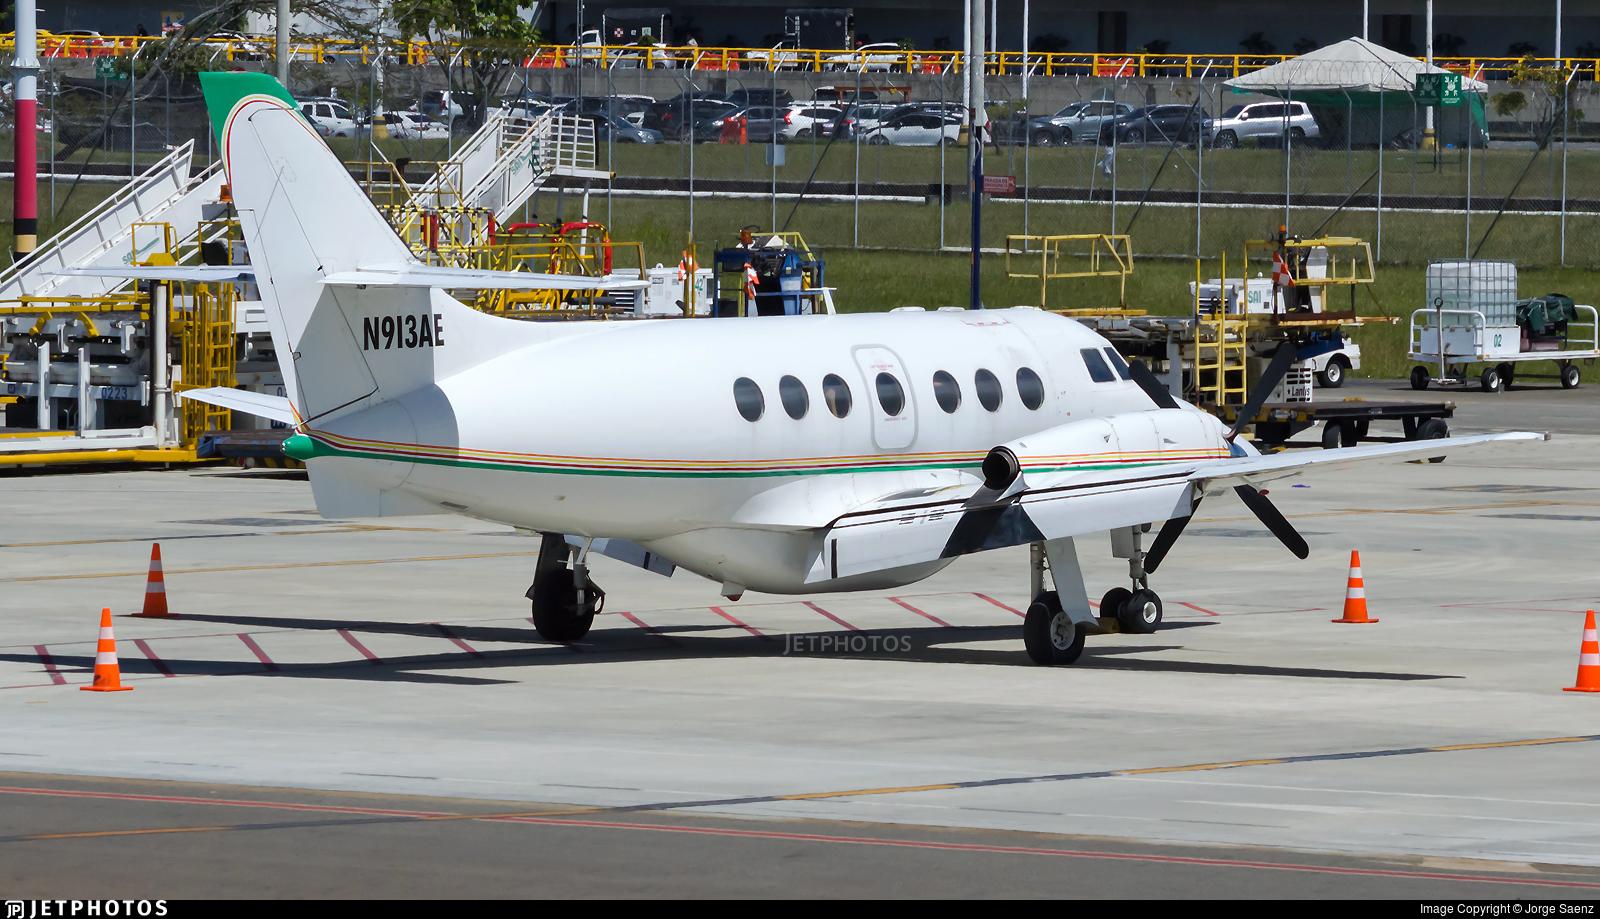 N913AE - British Aerospace Jetstream 31 - Private